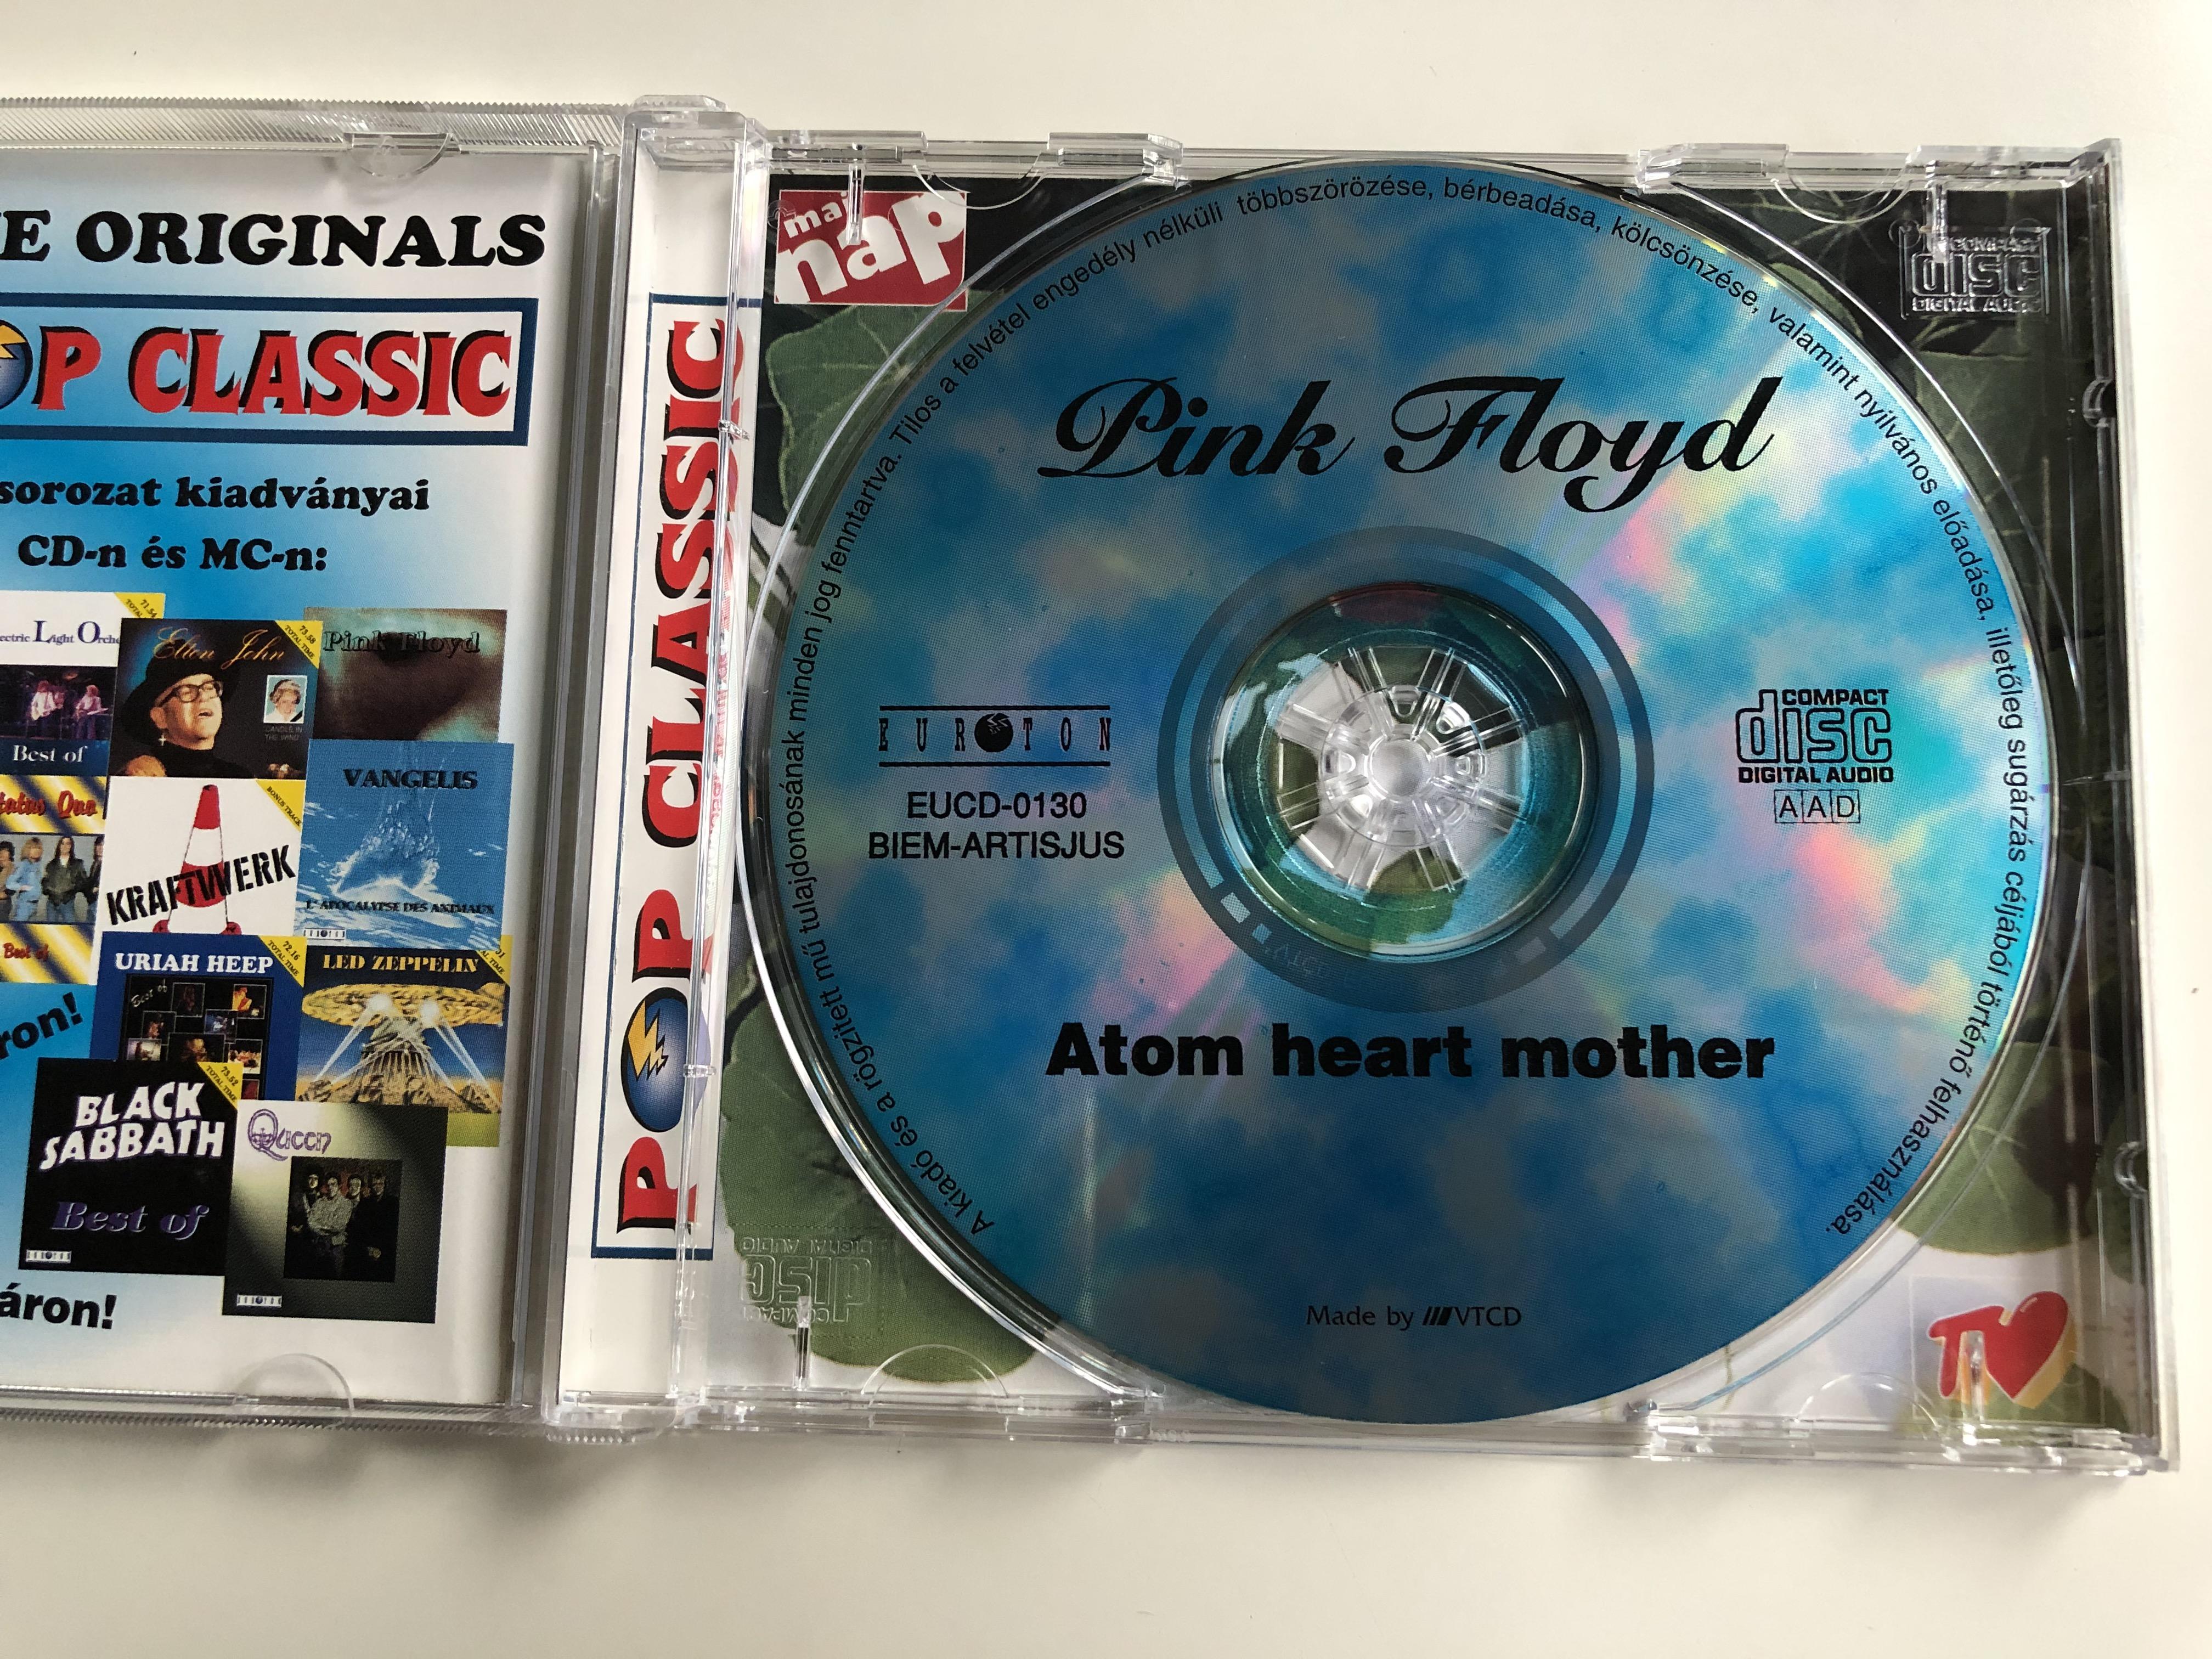 pink-floyd-atom-heart-mother-pop-classic-euroton-audio-cd-eucd-0130-2-.jpg